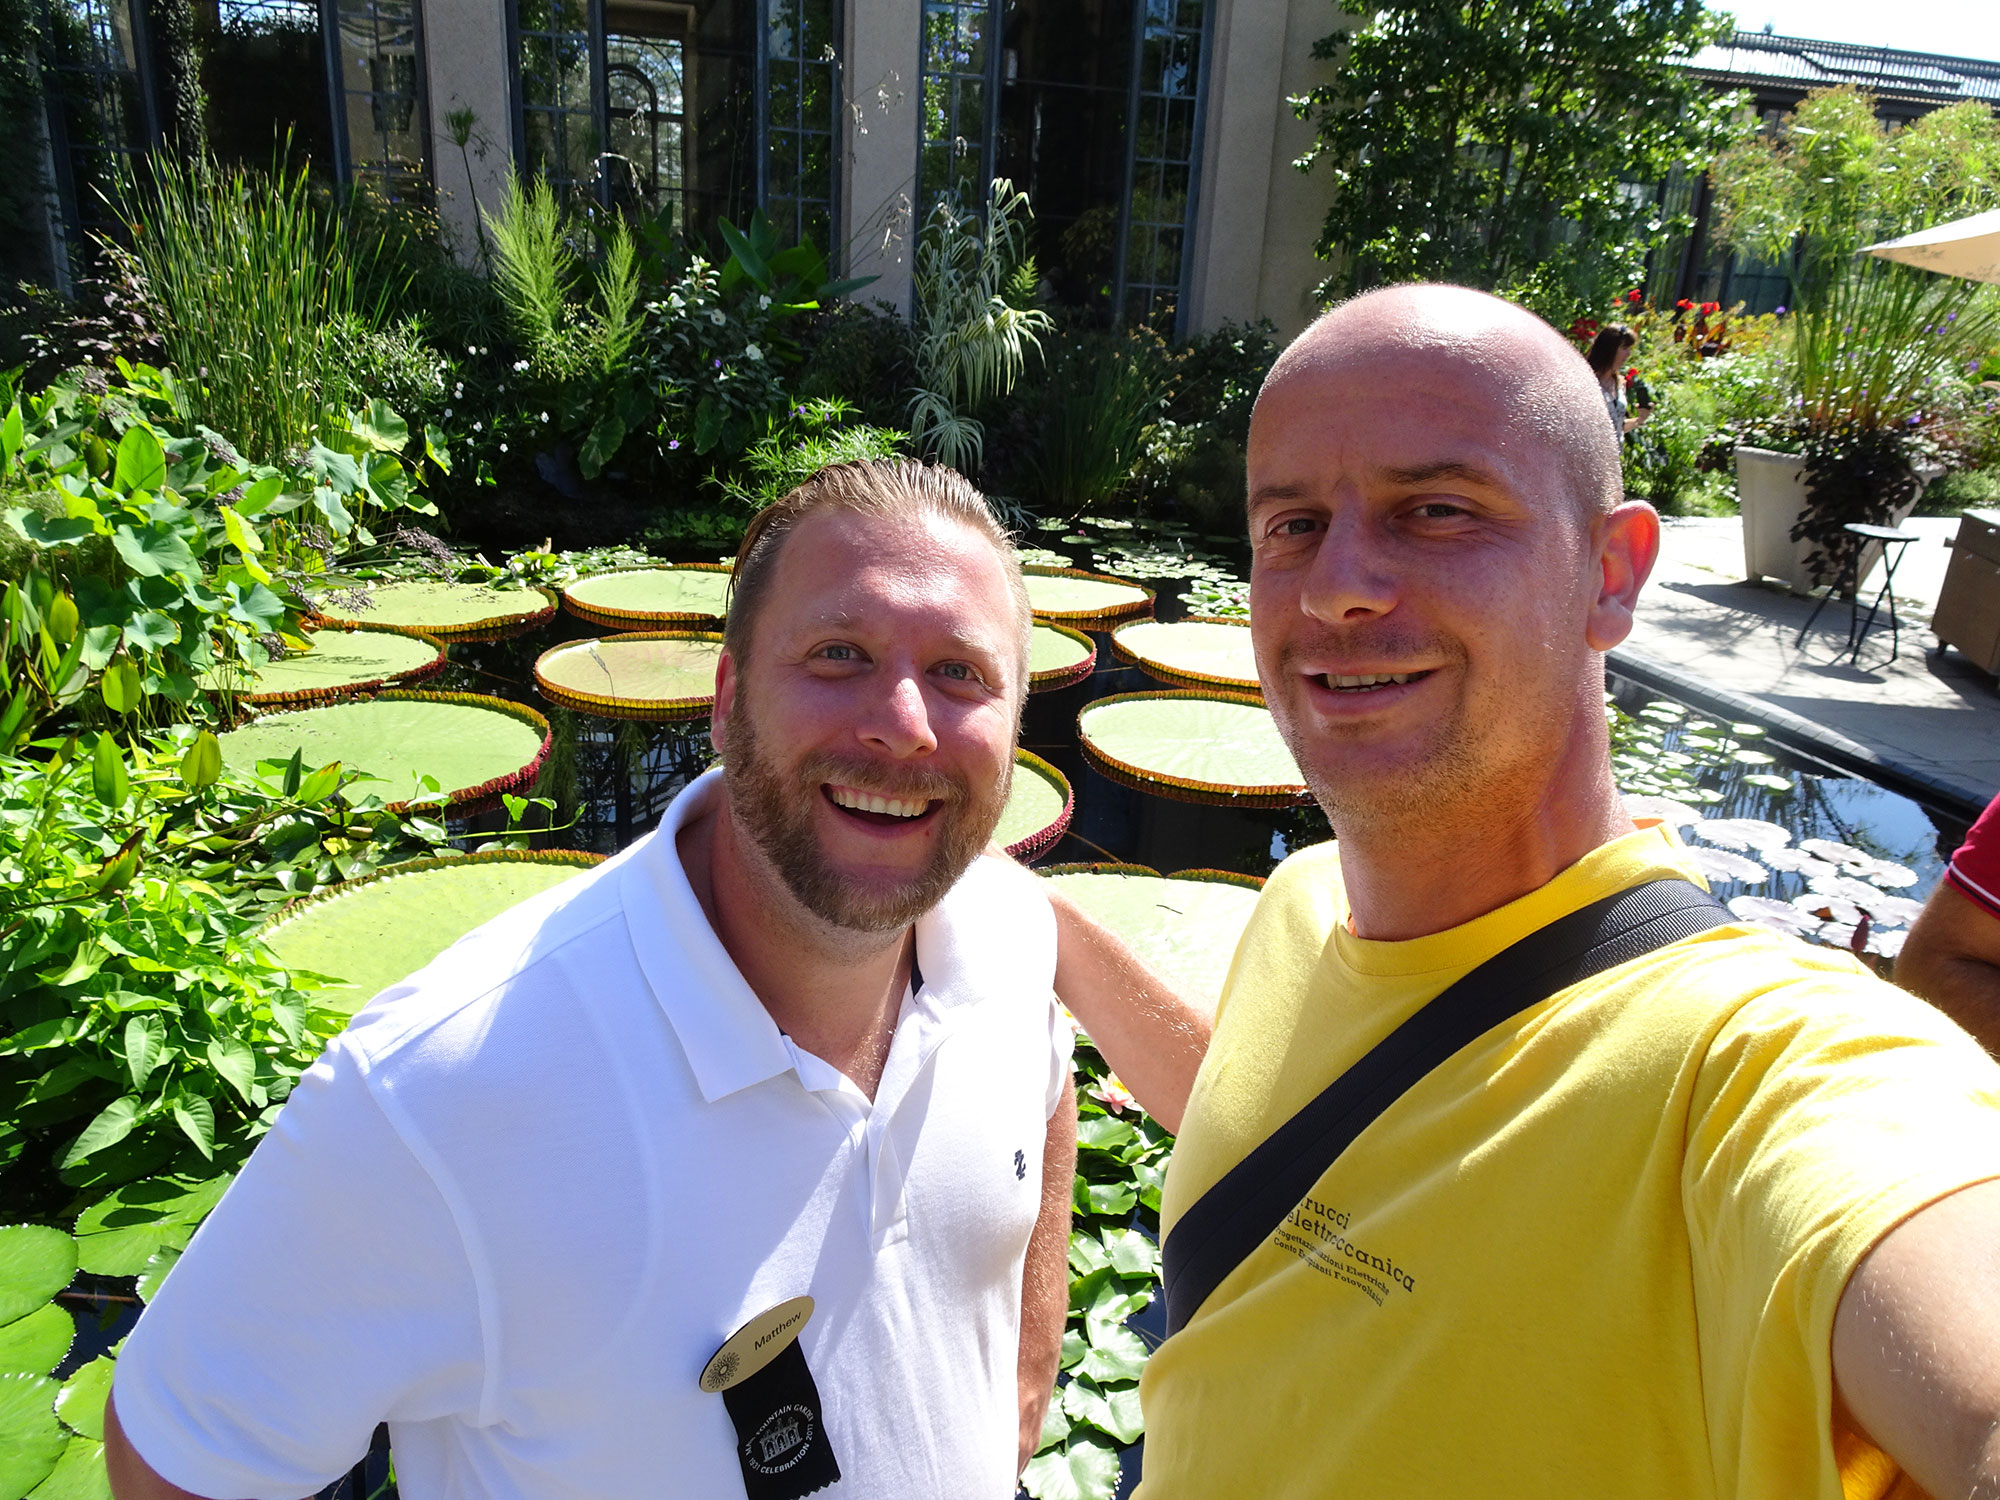 Matthew and Gianluca at Longwood gardens